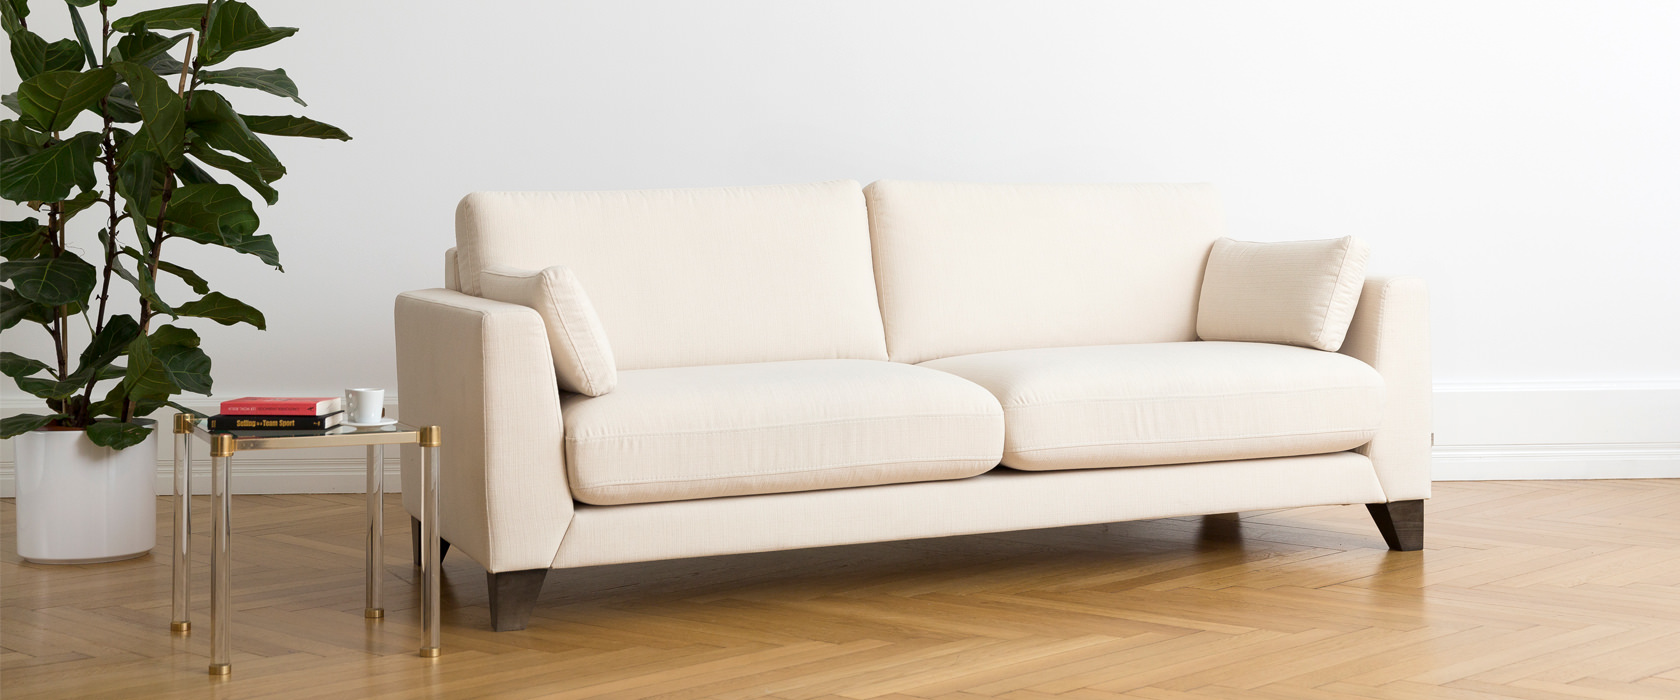 Трехместный диван Paolo - Фото 2 - Pufetto